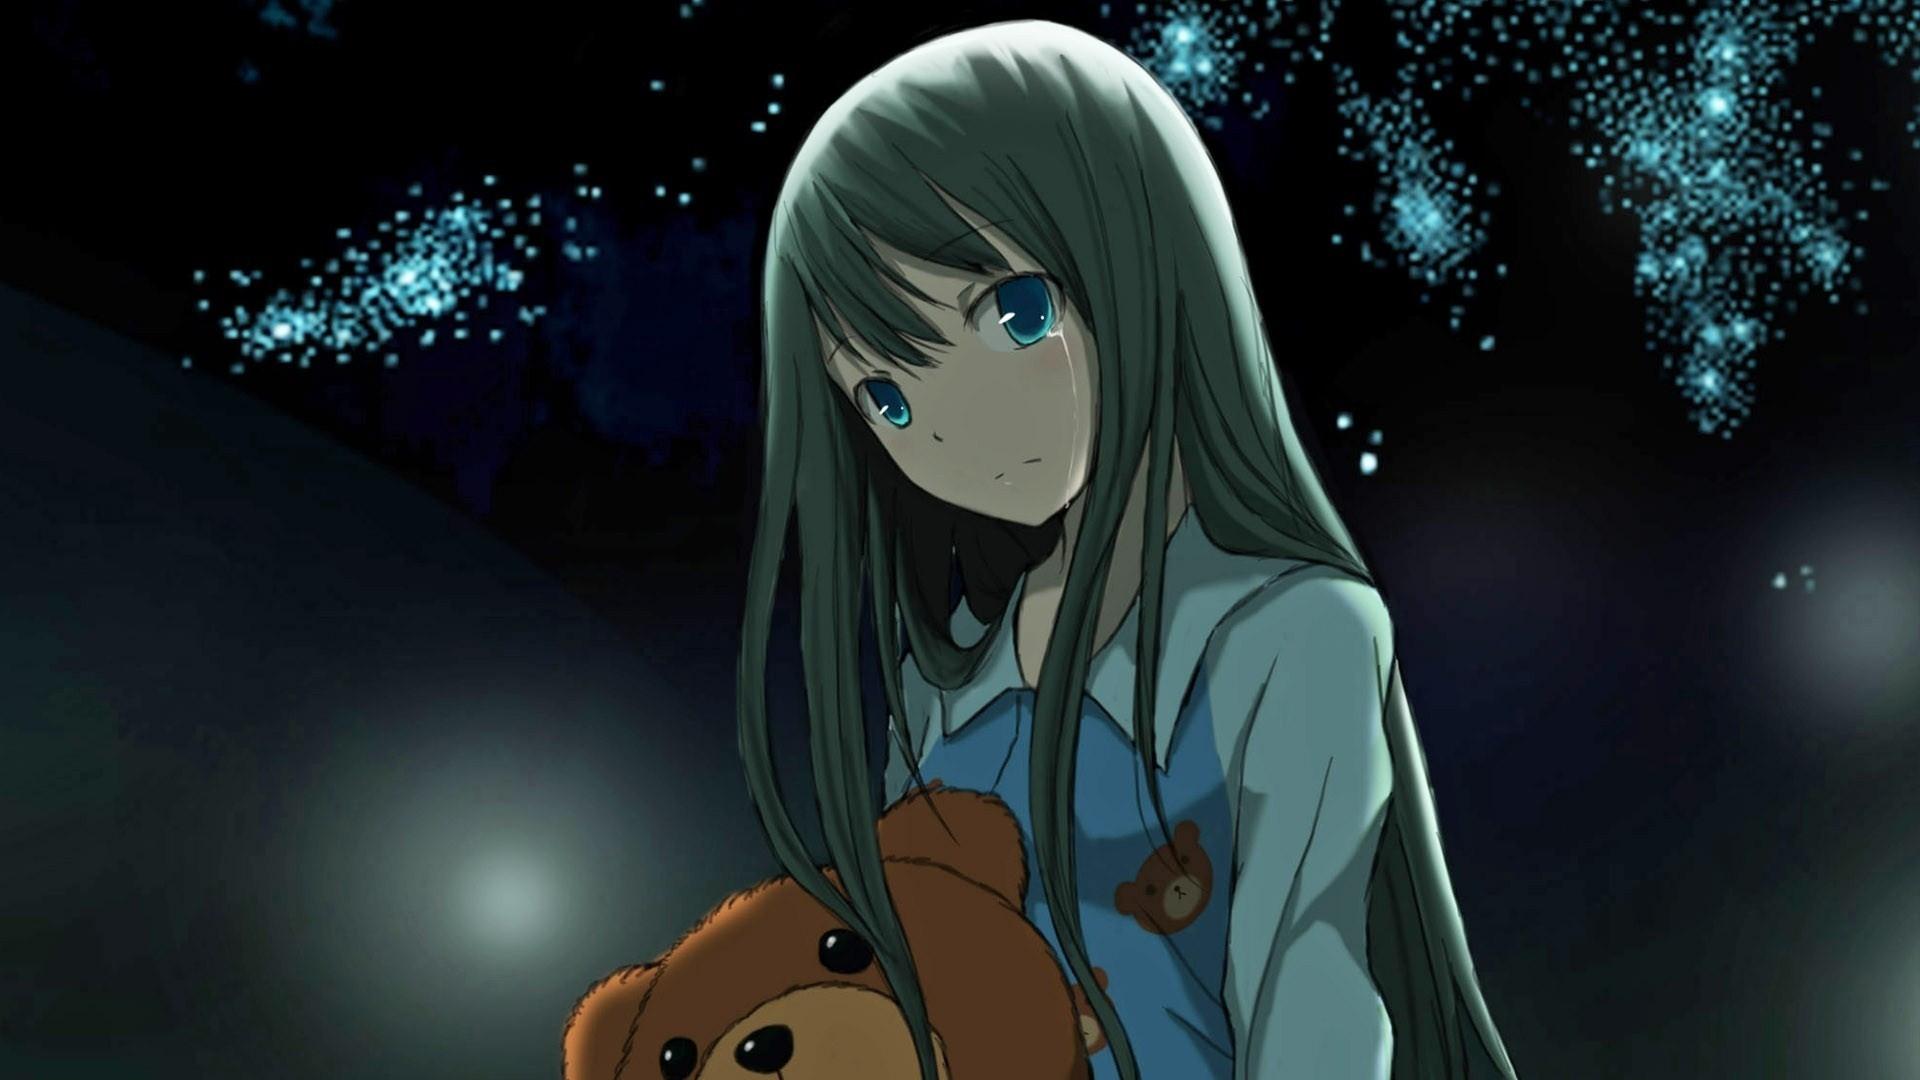 anime, girl, toy